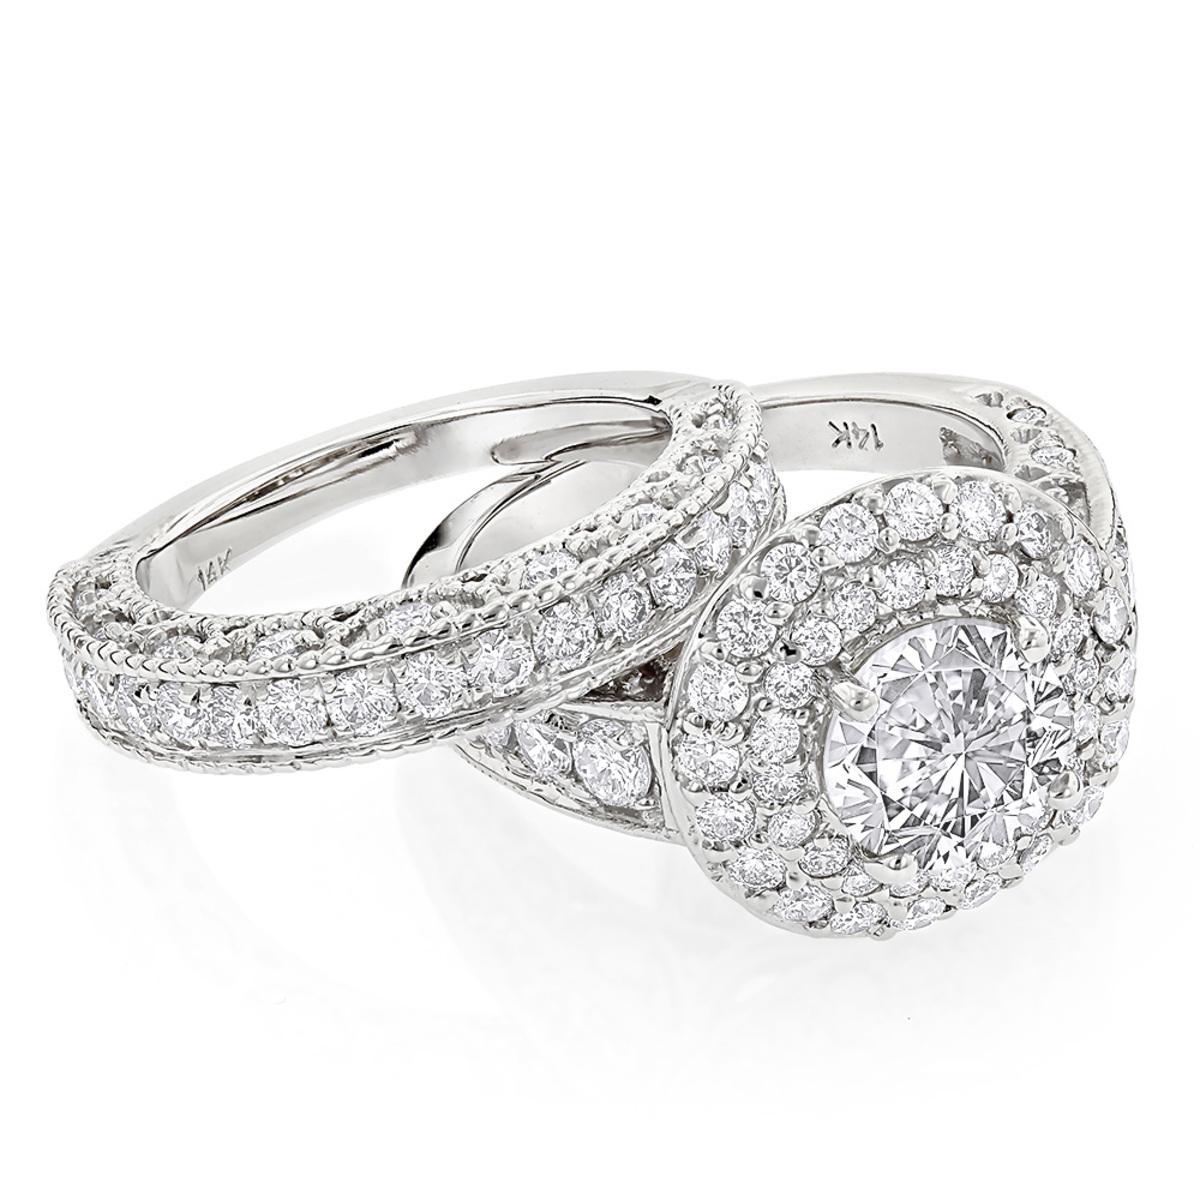 14K Gold Diamond Unique Engagement Ring Mounting Set 3ct